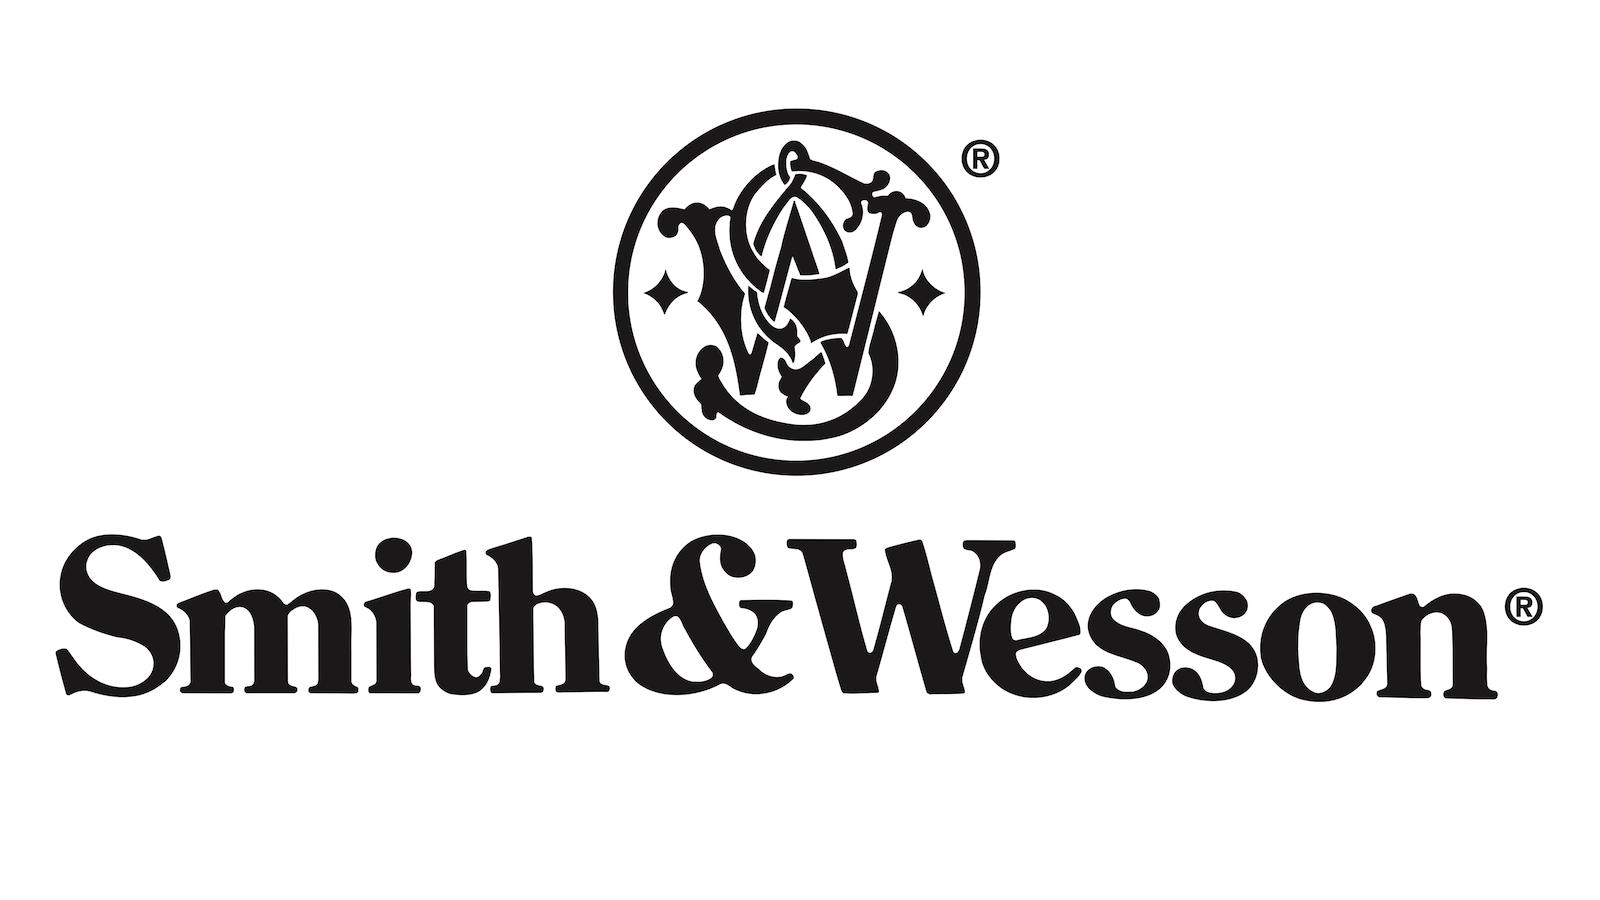 Smith & Wesson Corp. to Acquire Gemini Technologies